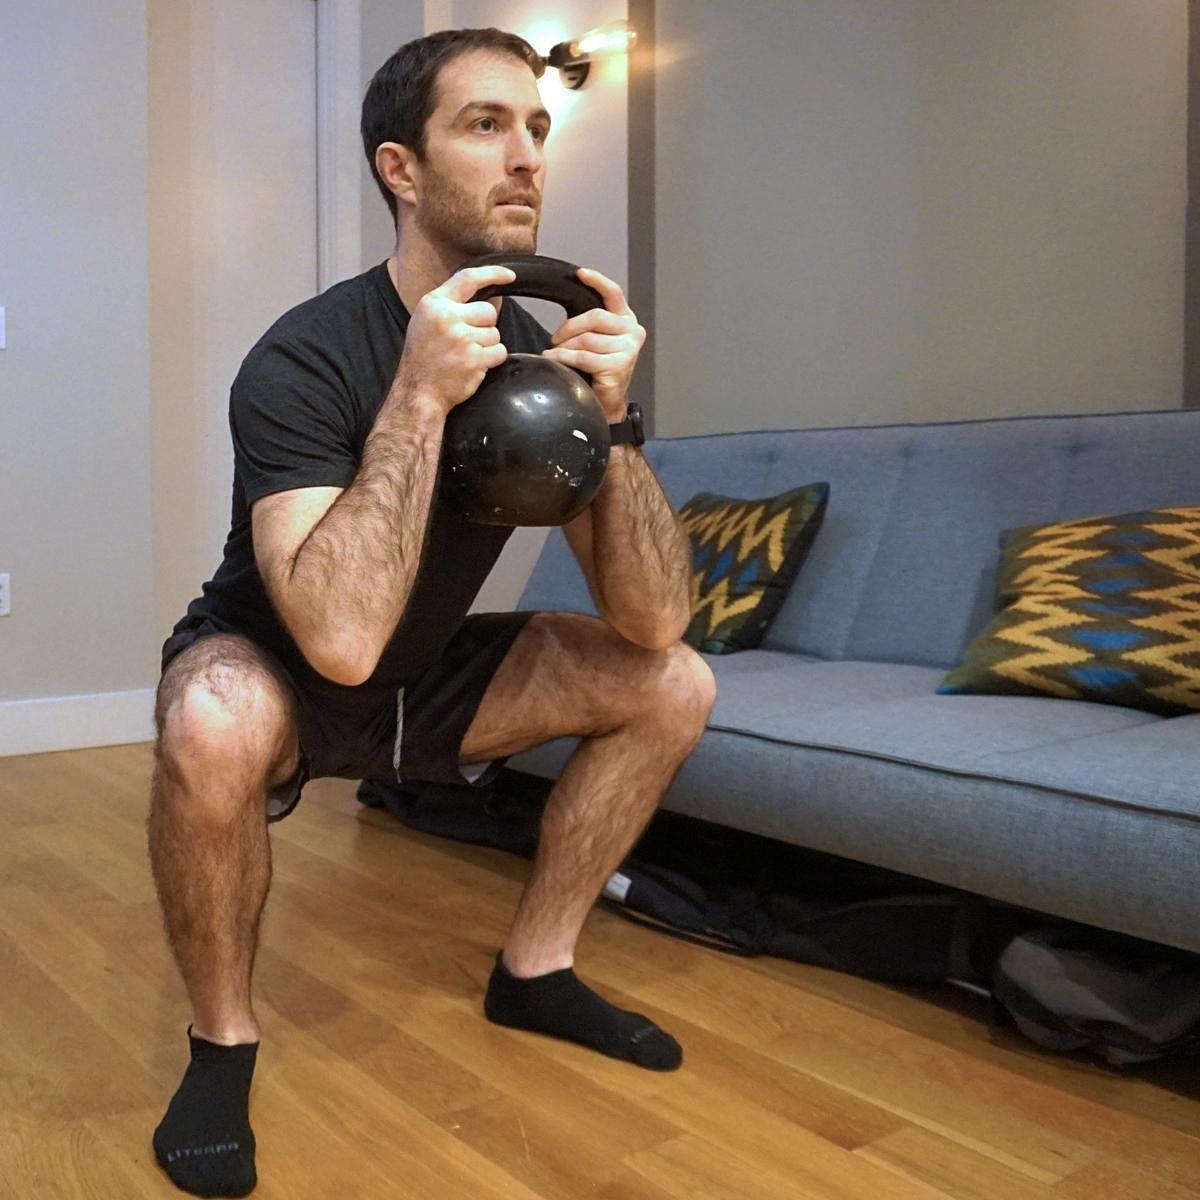 Virtual Dumbbell or Kettlebell Circuit Training